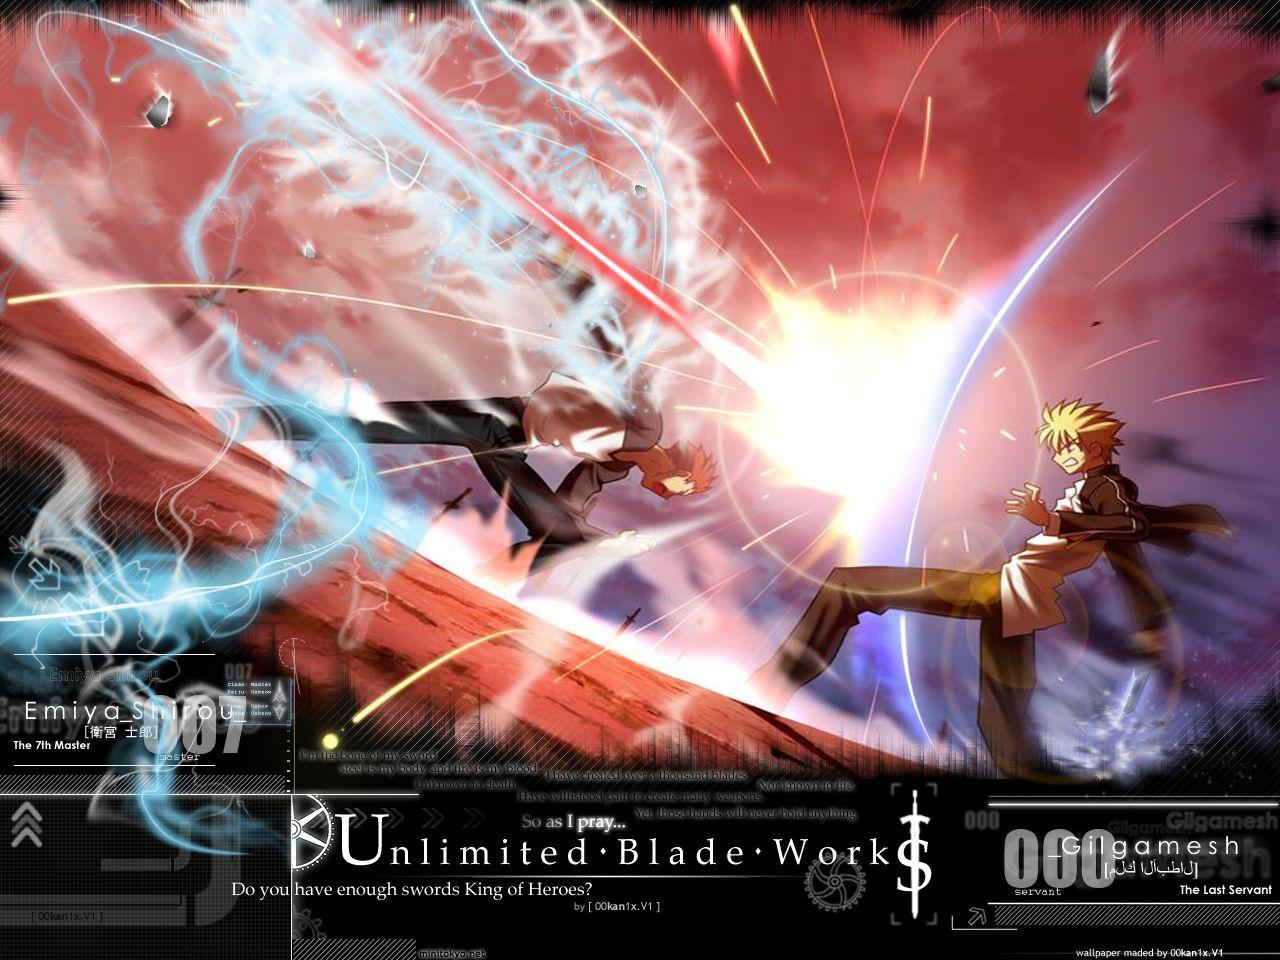 Anime Fate Stay Night Unlimited Blade Works Archer Gilgamesh Shirou Emiya Wallpaper Fate Stay Night Stay Night Fate